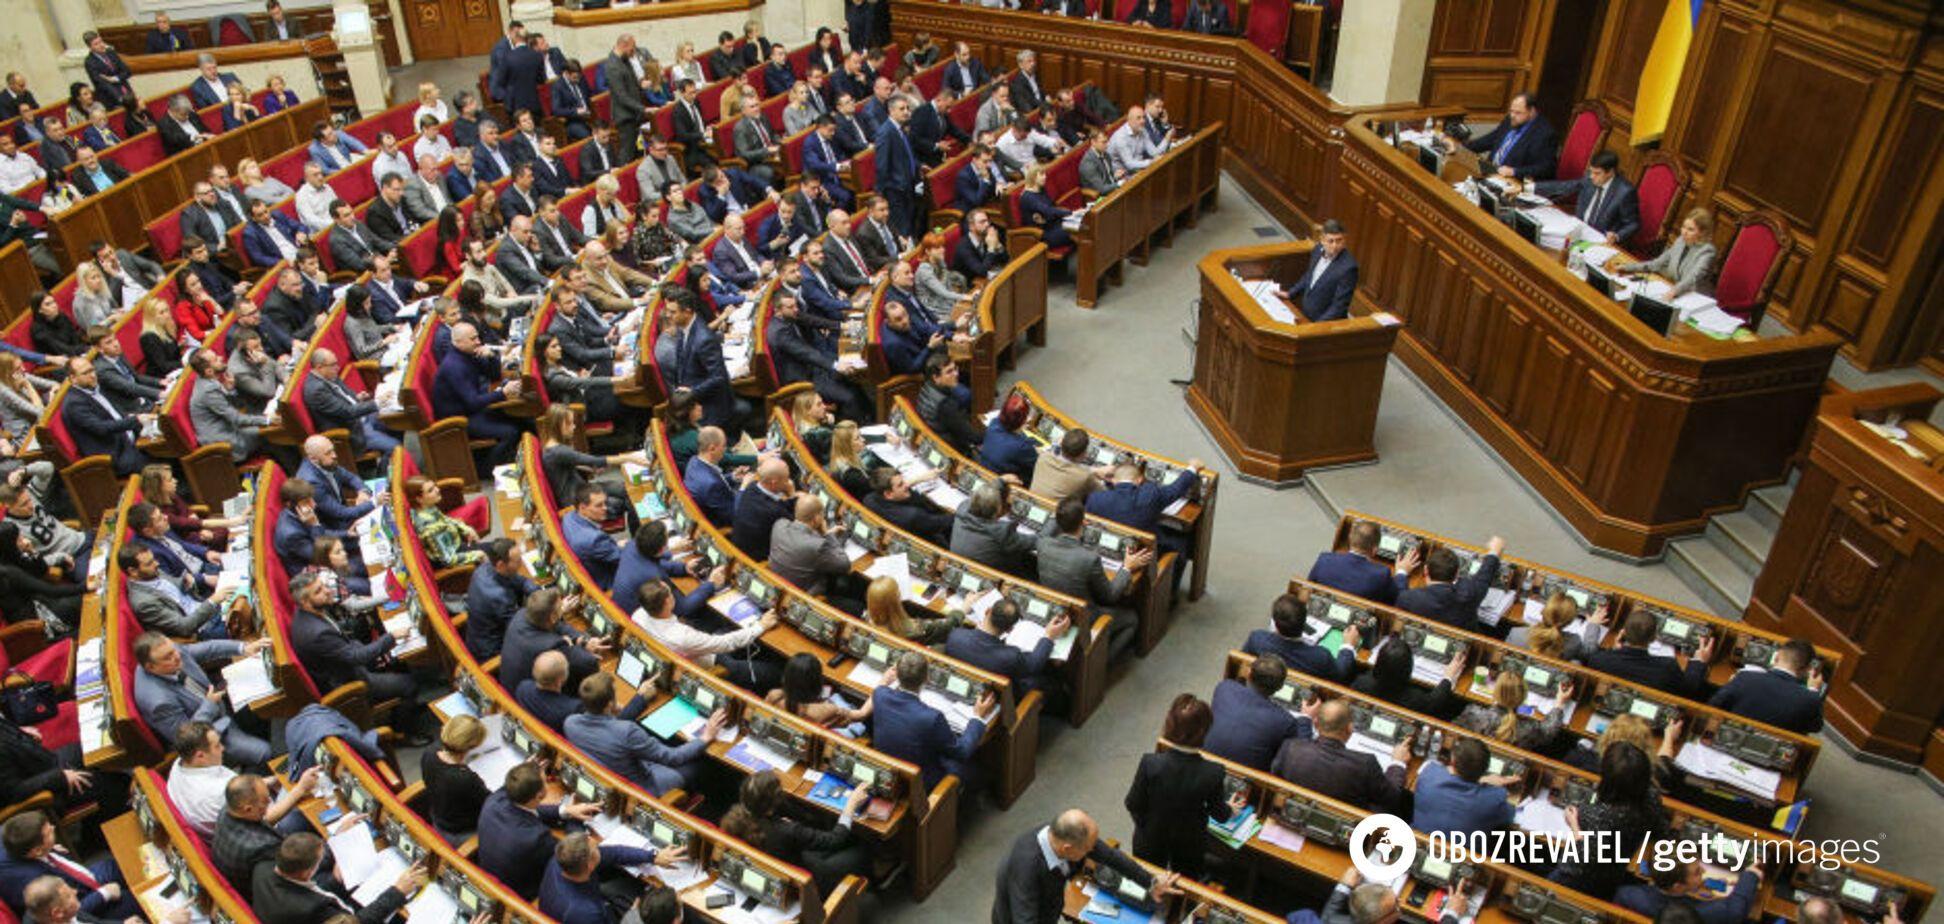 Рада проведе ще одне позачергове засідання: названо дату